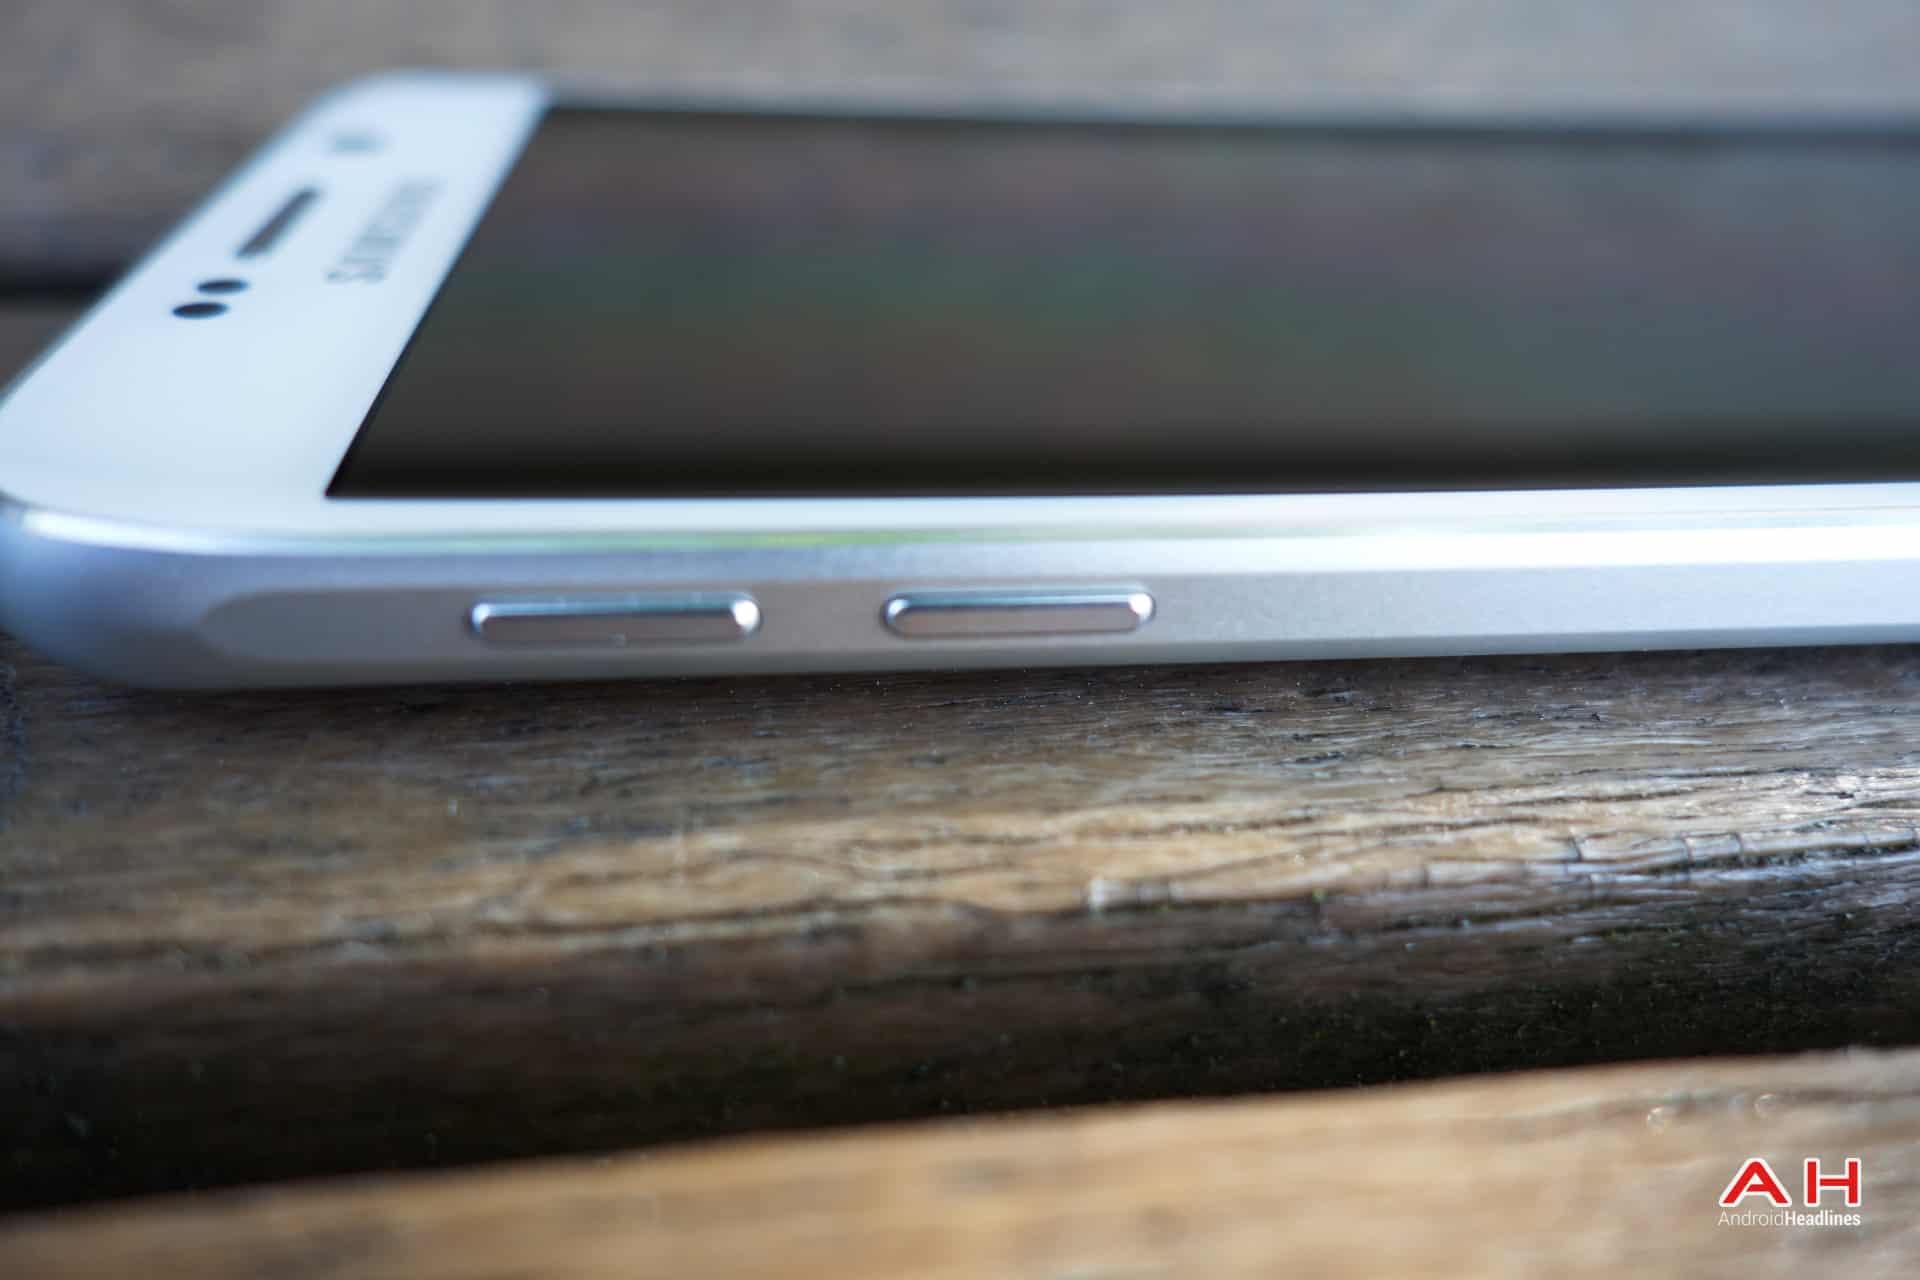 AH Samsung Galaxy S6 4